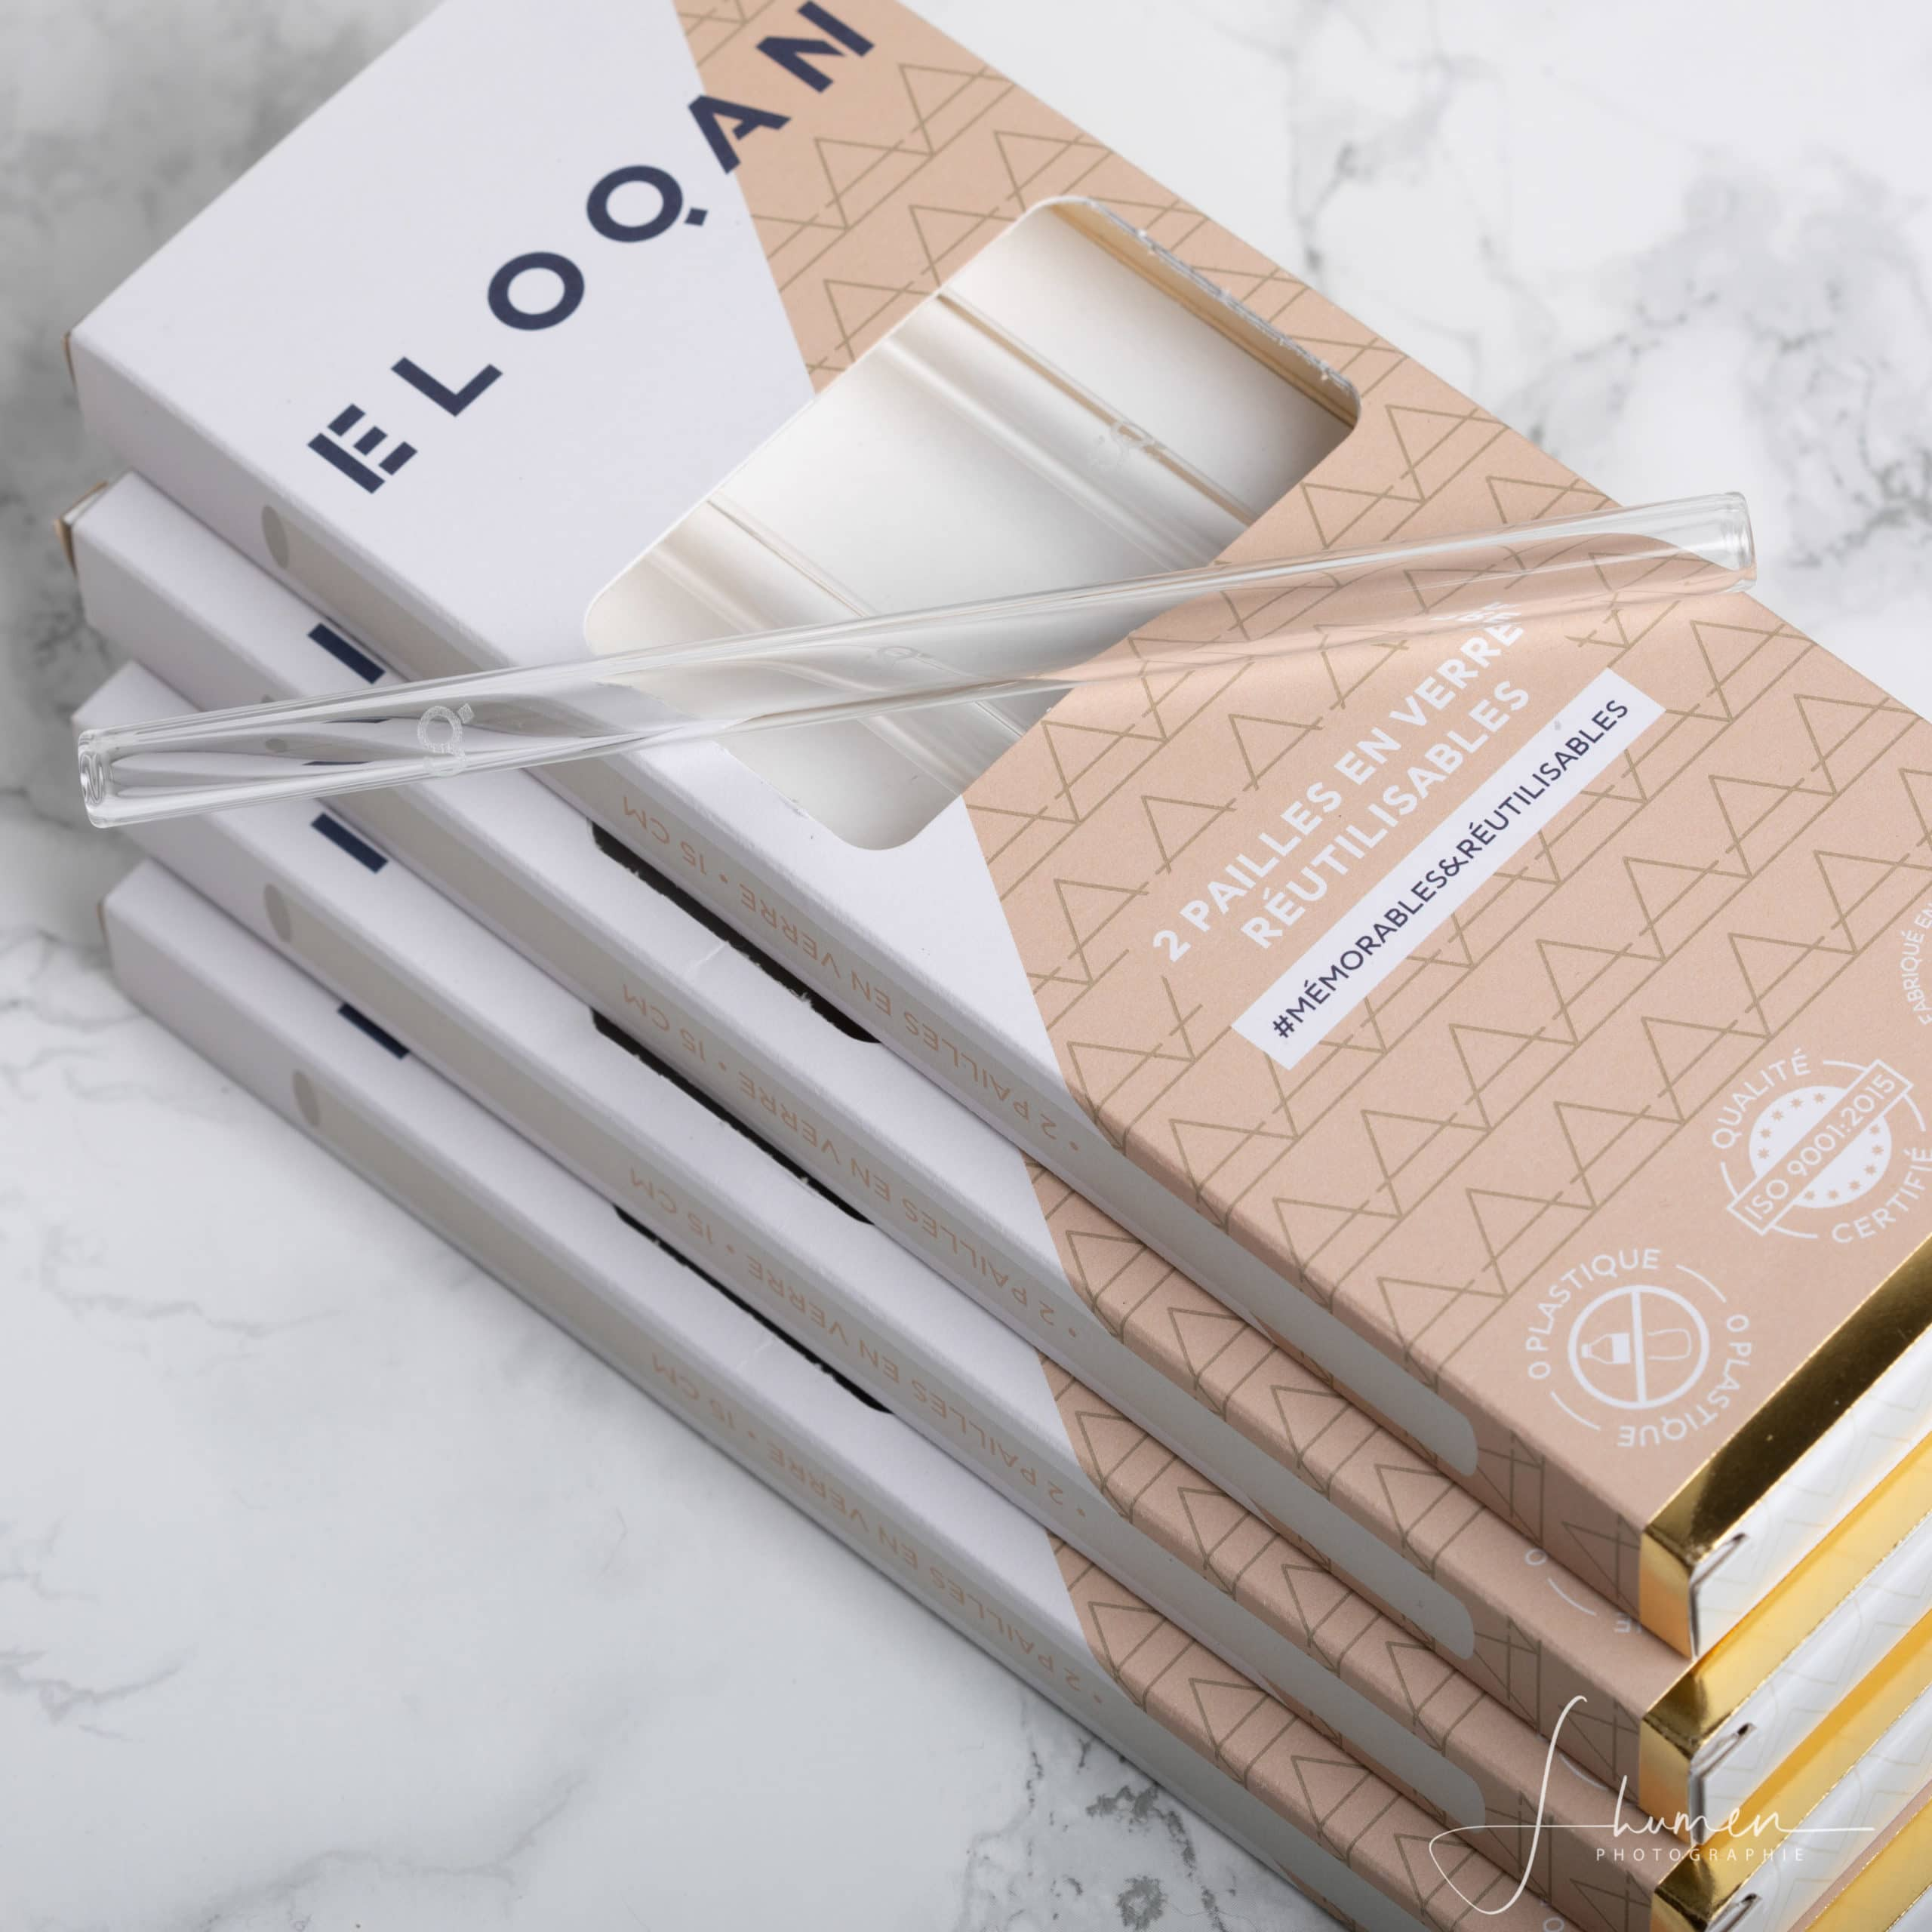 Pailles en verre – Pack Air – Eloqan